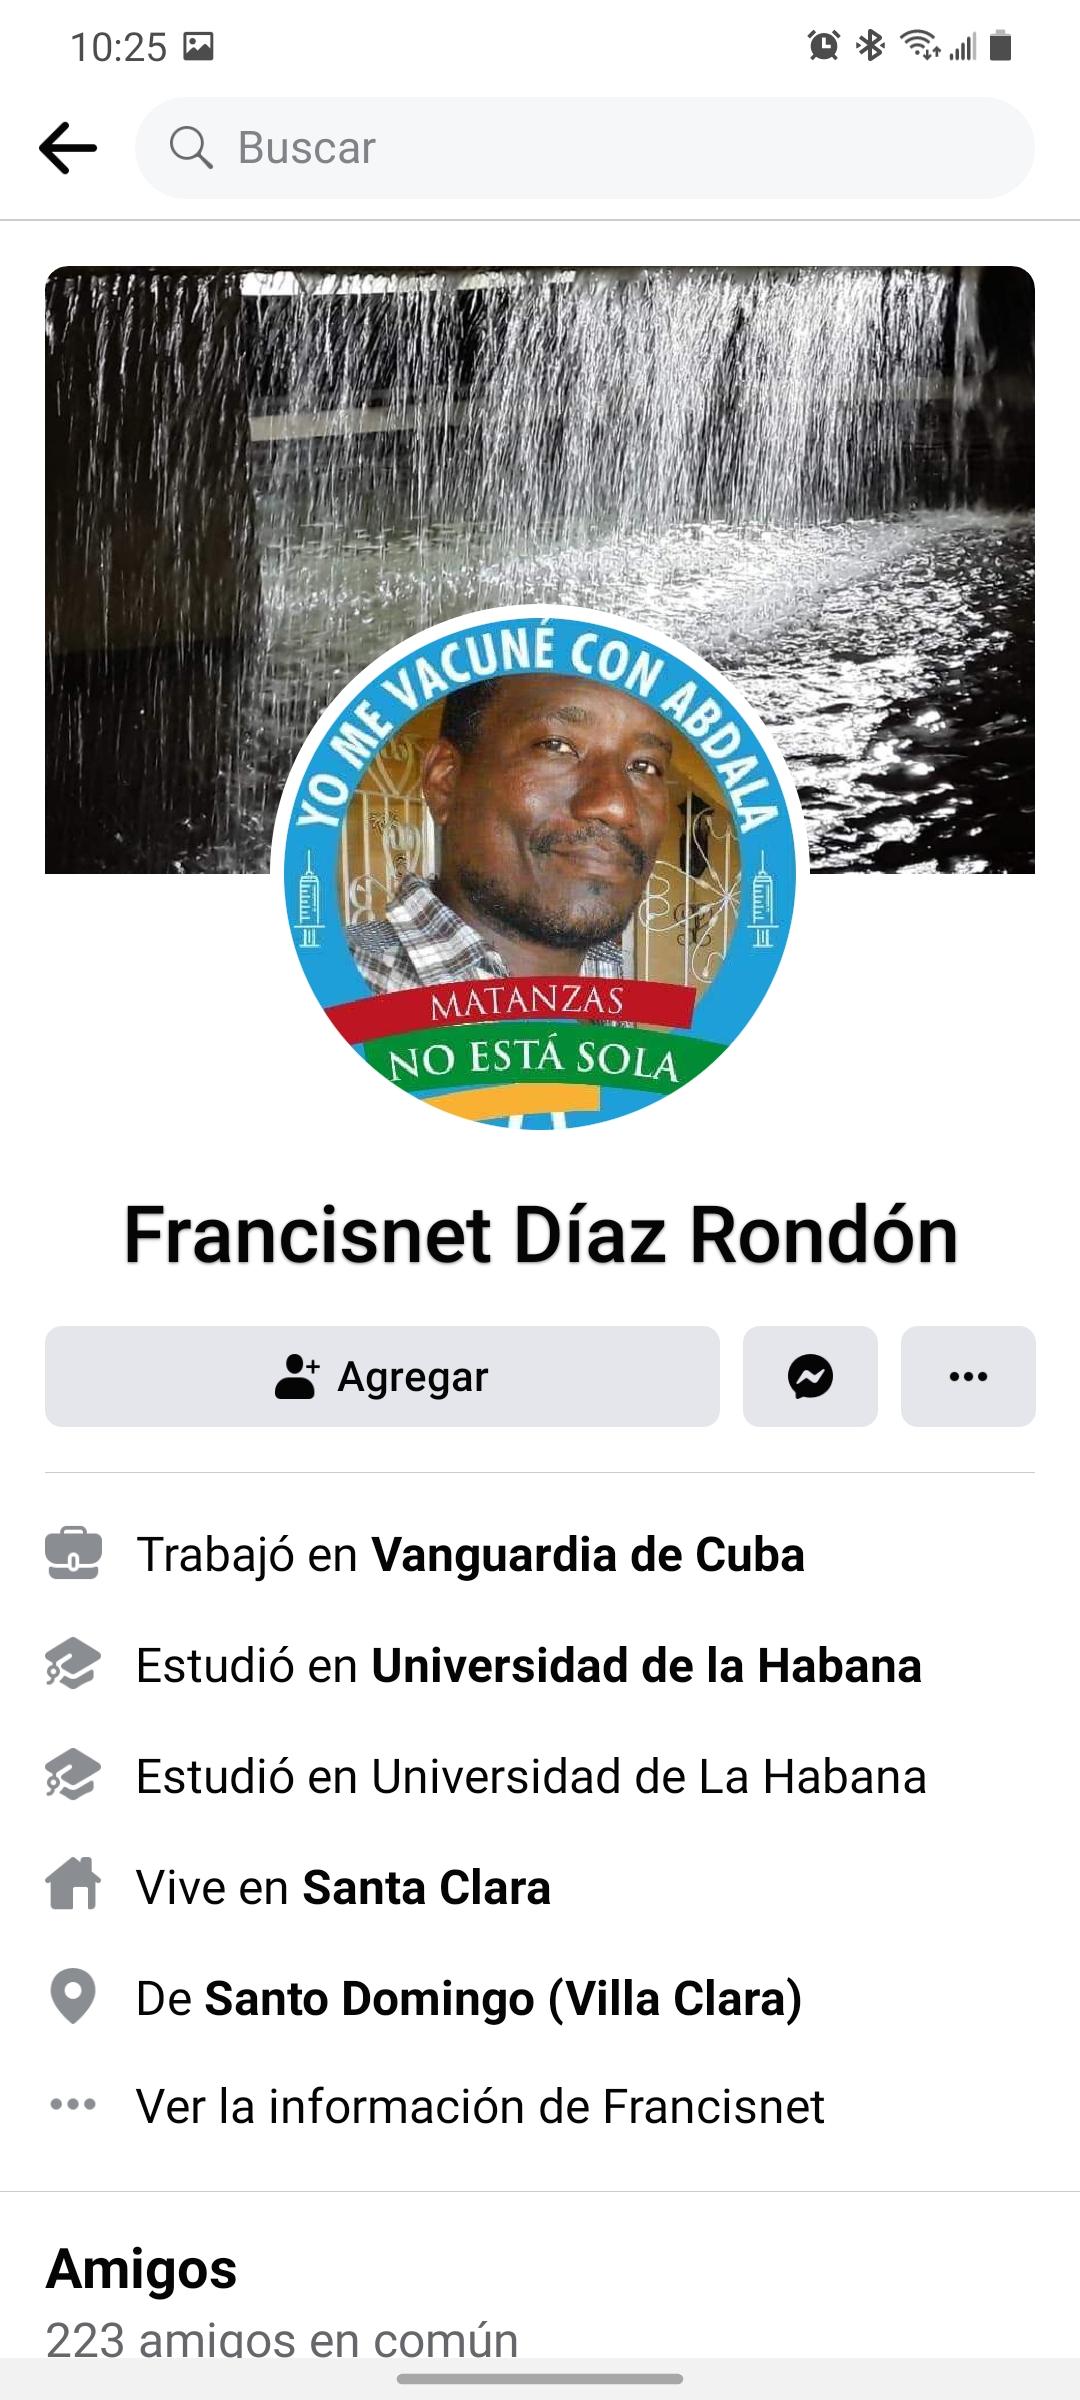 Francisnet Diaz Rondon